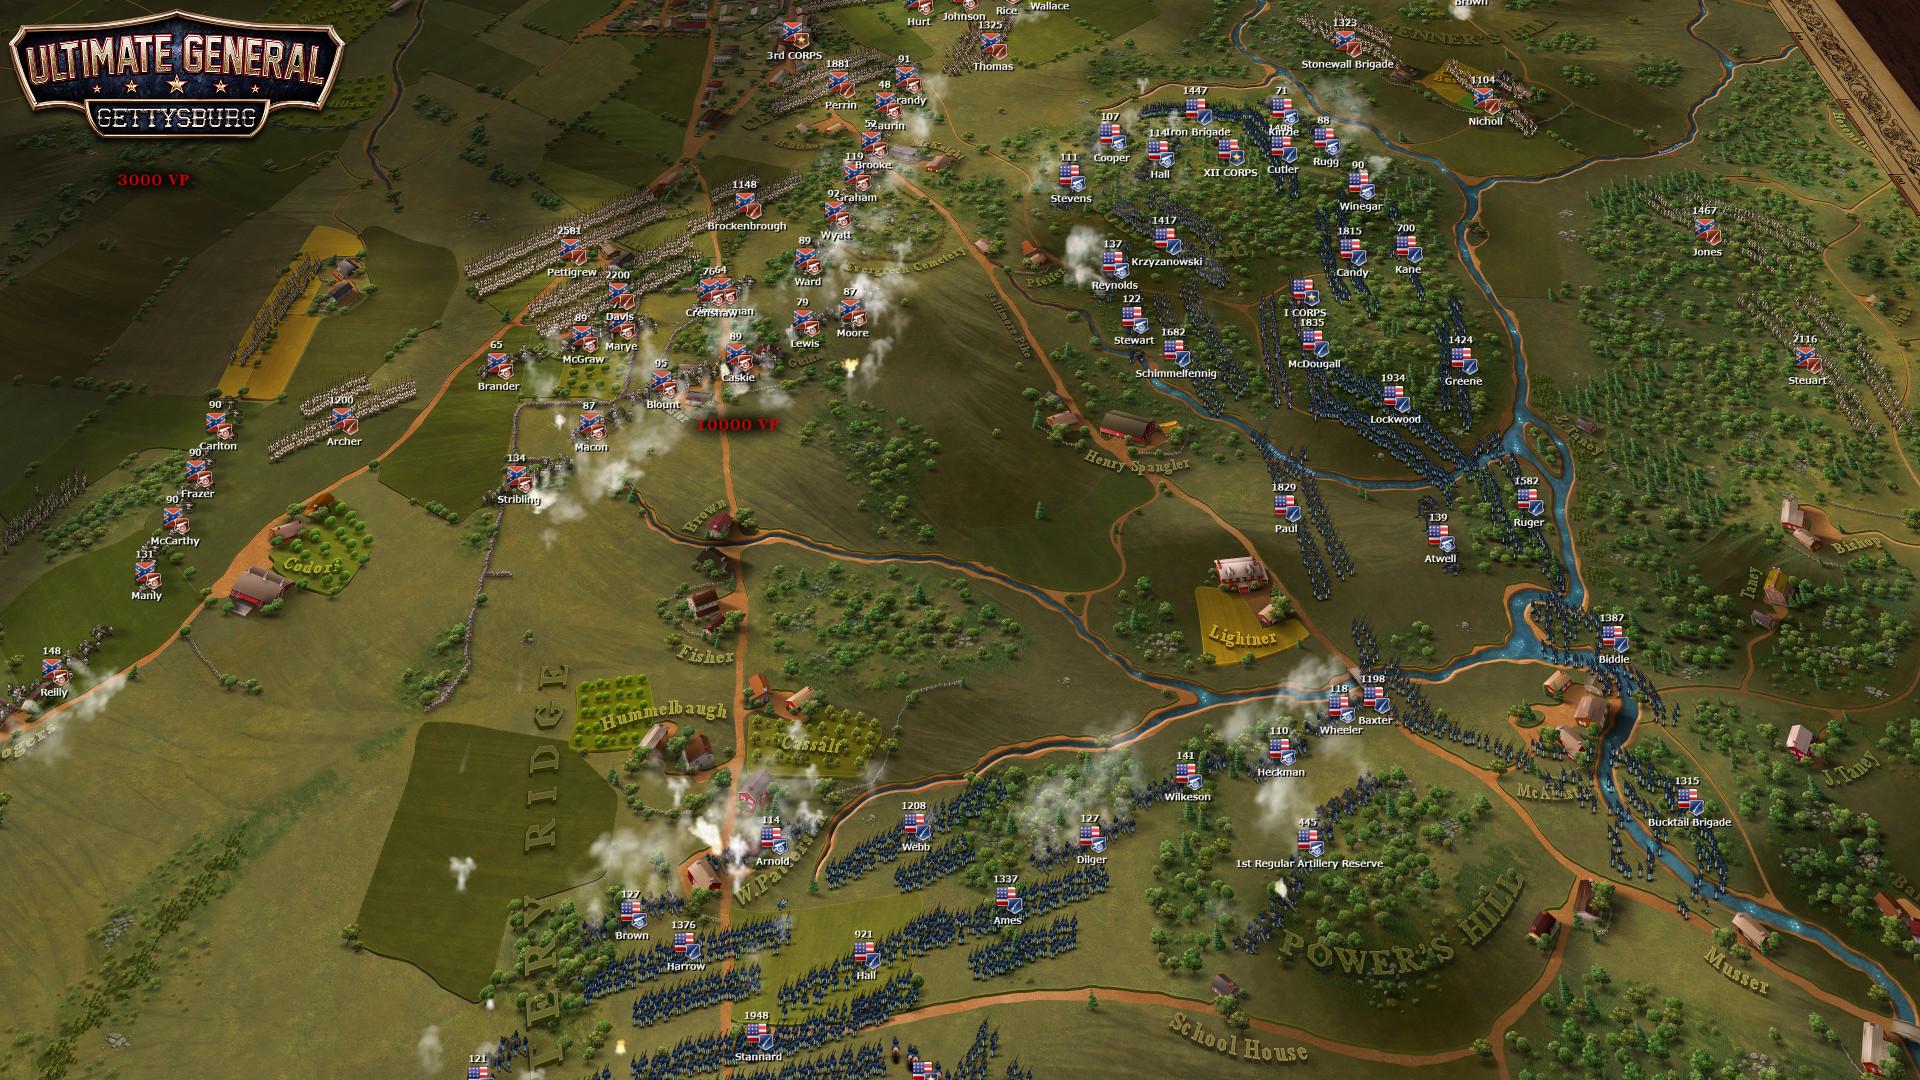 Ultimate general: gettysburg iphone game free. Download ipa for.